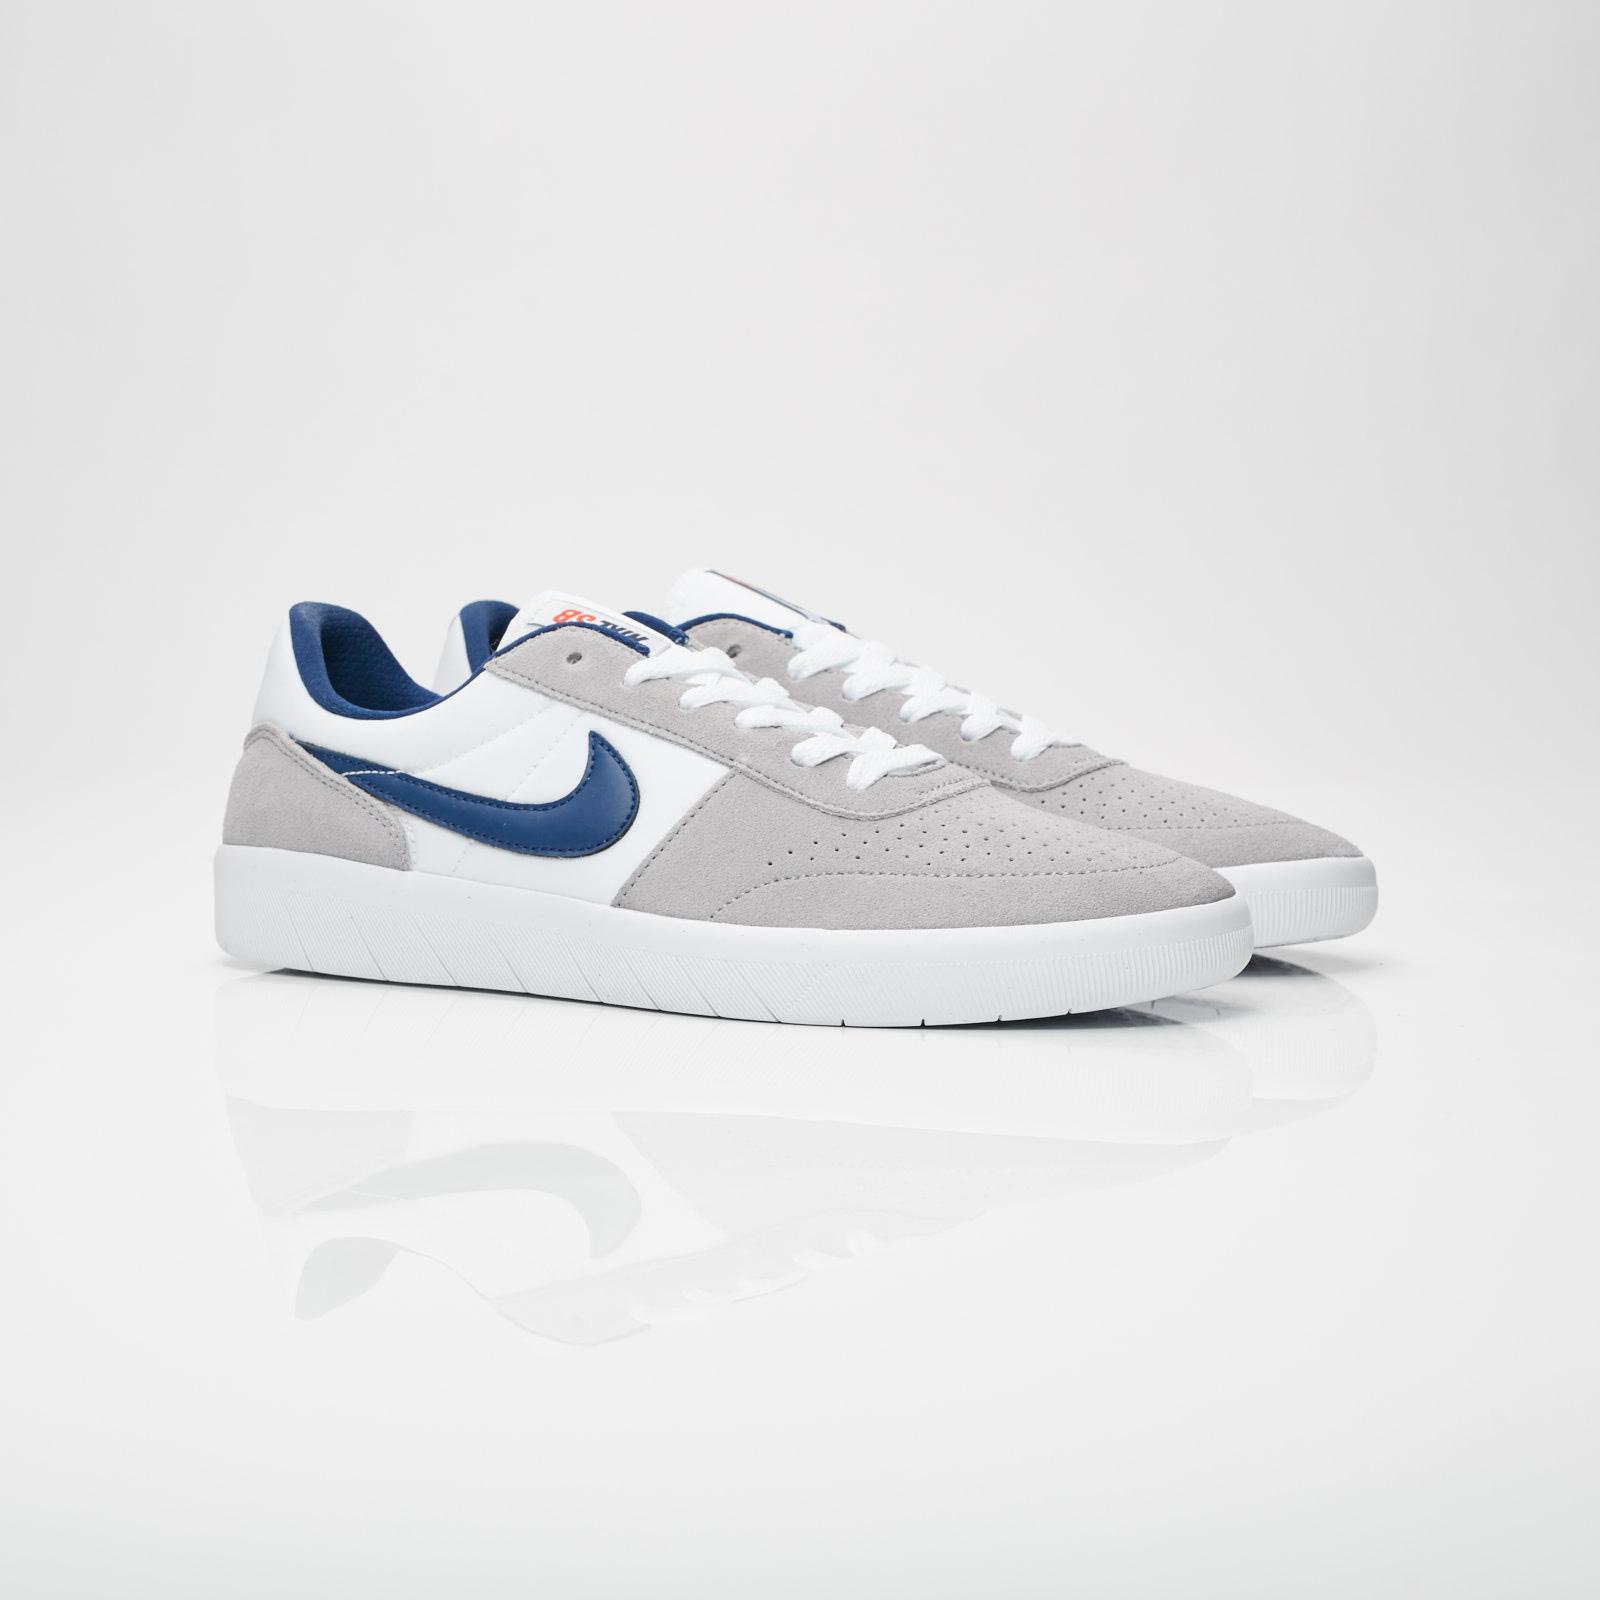 296a504d7fd76 Nike Team Classic - Ah3360-002 - Sneakersnstuff | sneakers ...